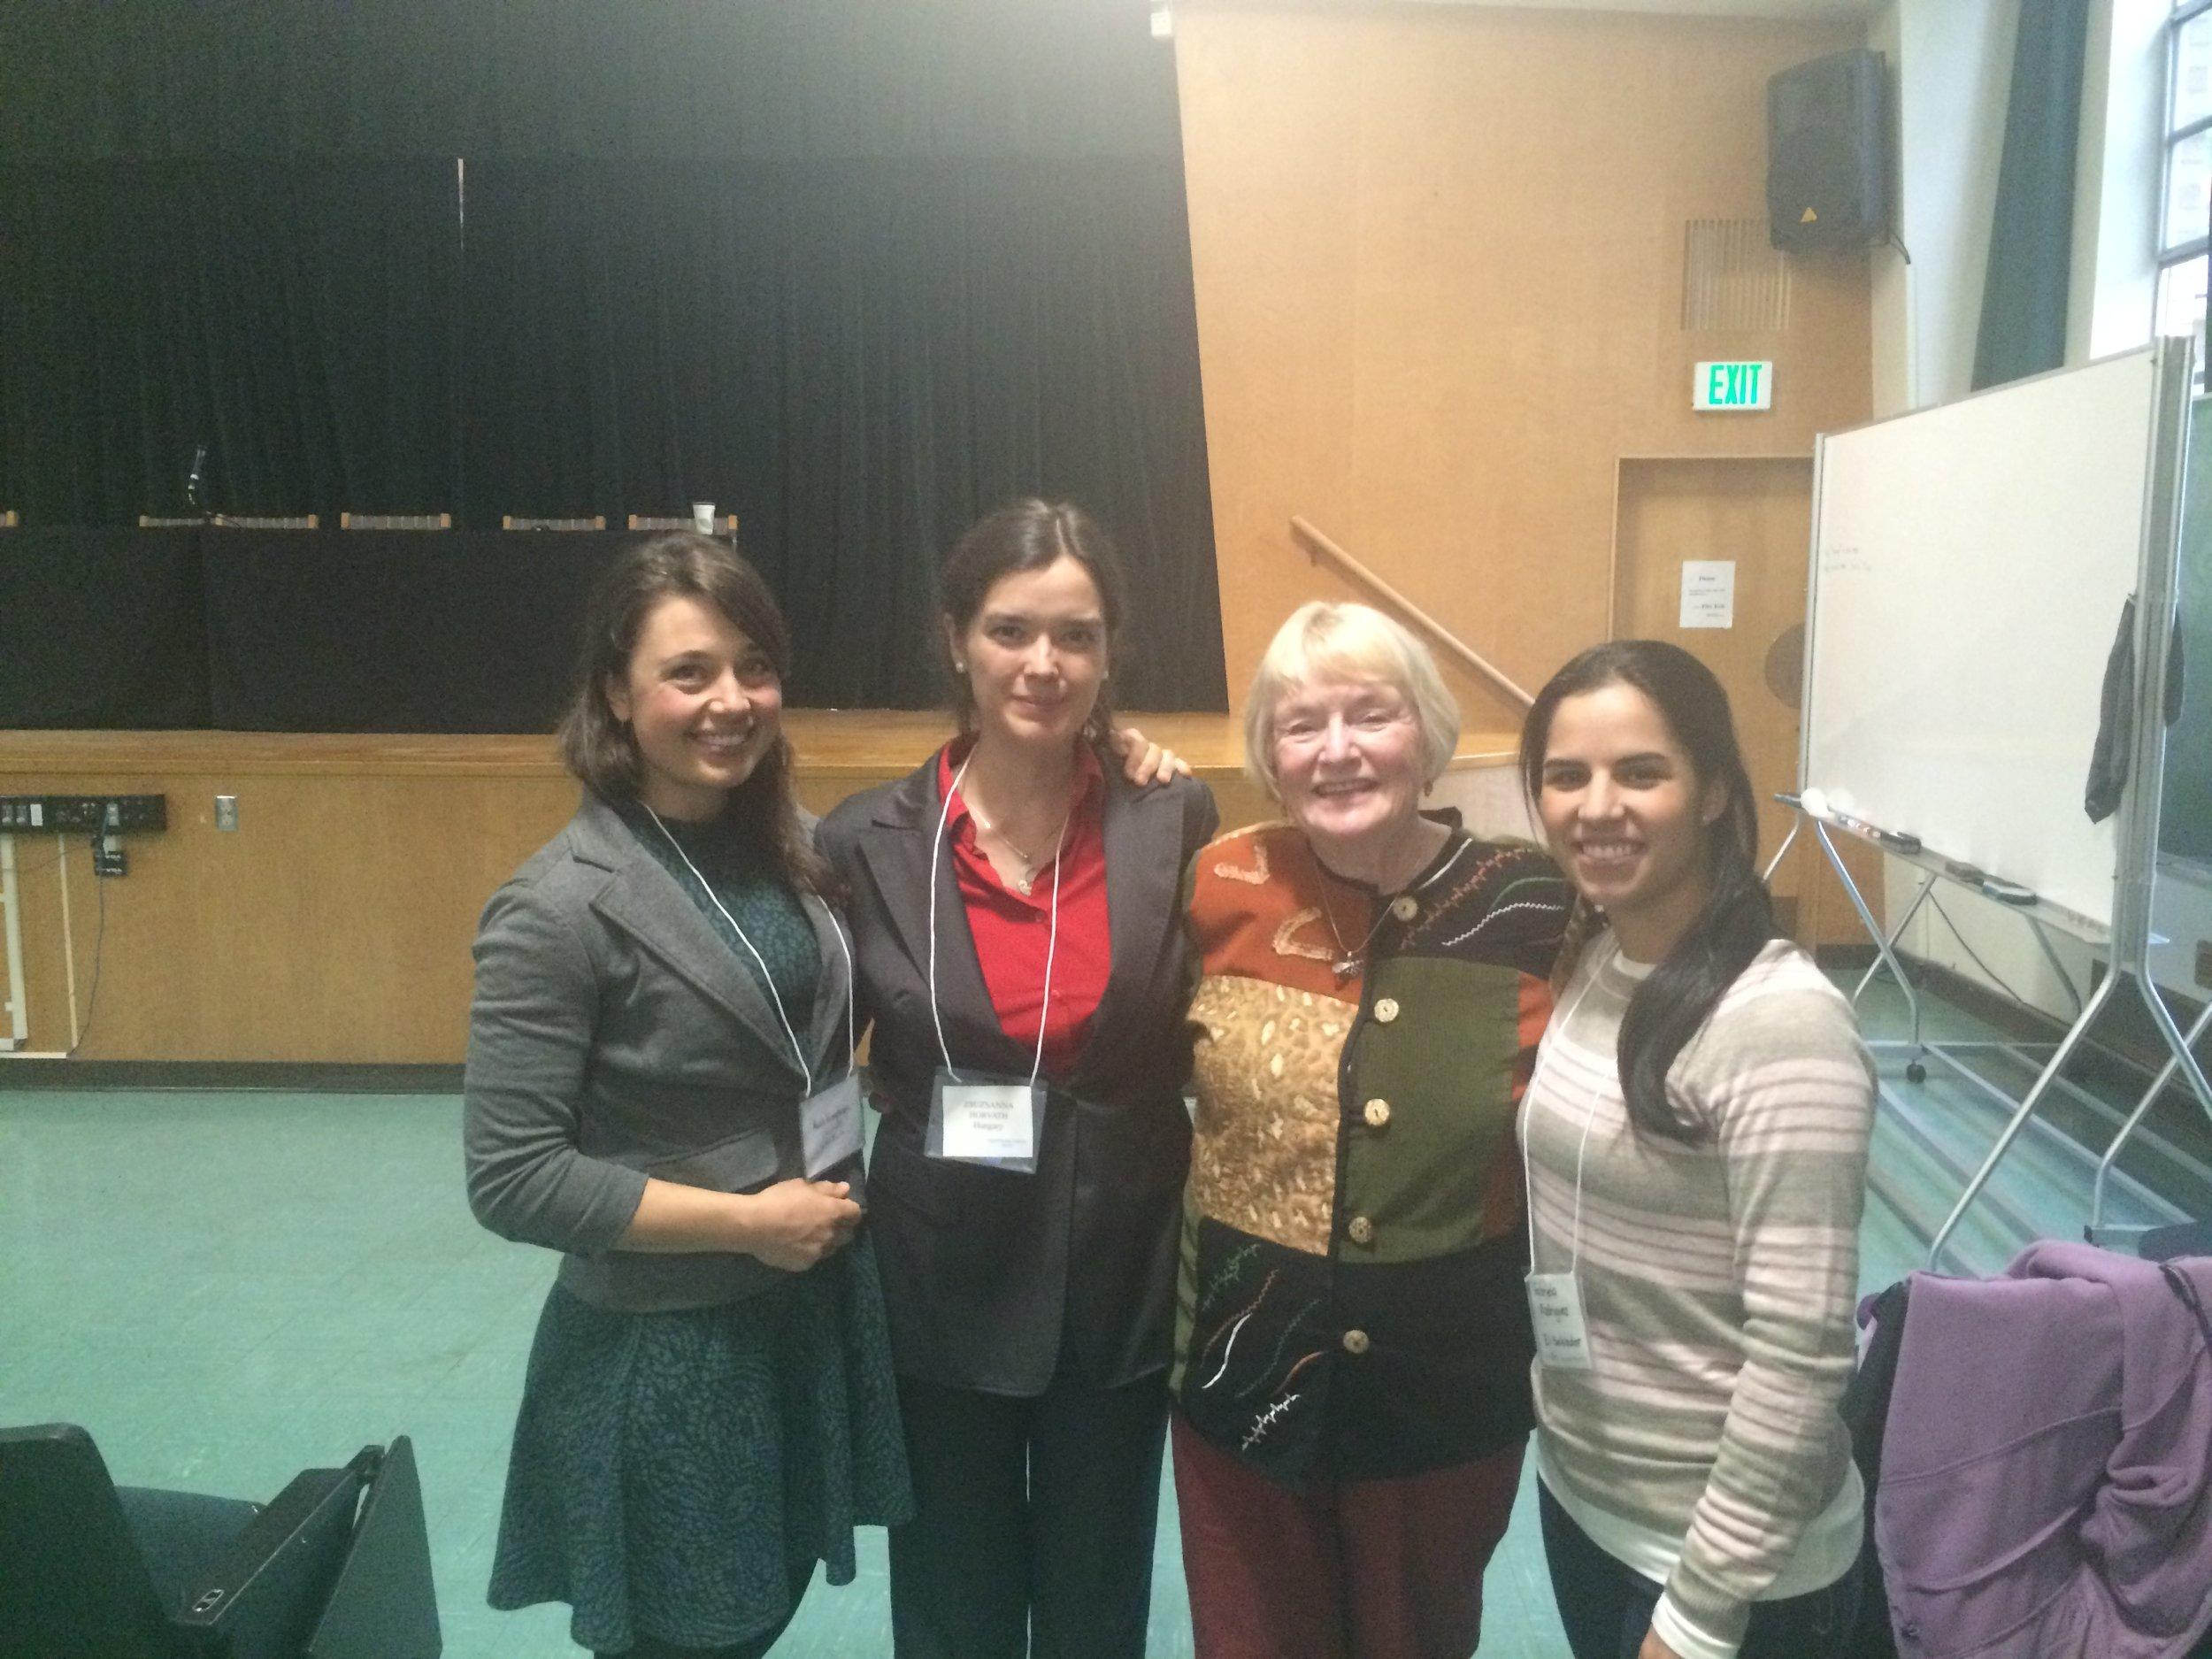 Me, Zsuzsanna, Sandra Bardsley, and Gabriella